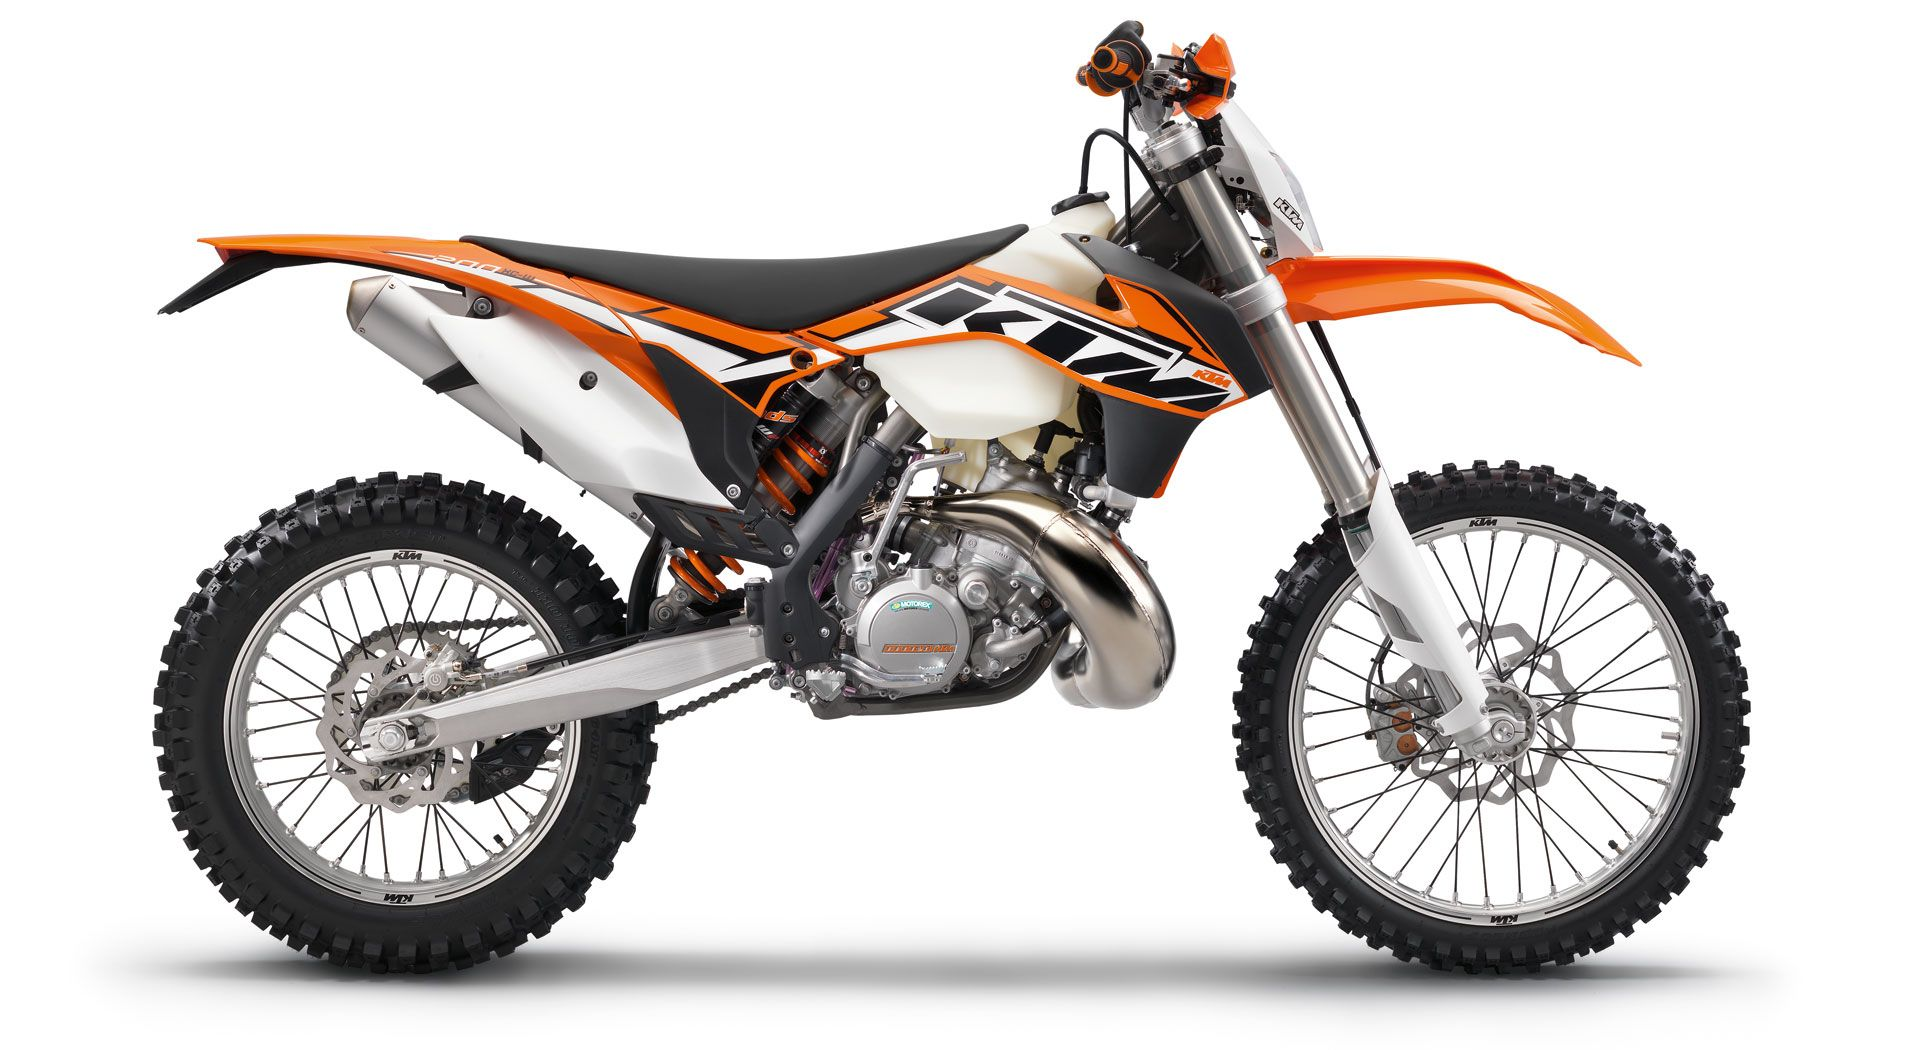 2014 Ktm 200 Xc W Perfect Union Ktm Enduro Enduro Motorcycle Ktm 250